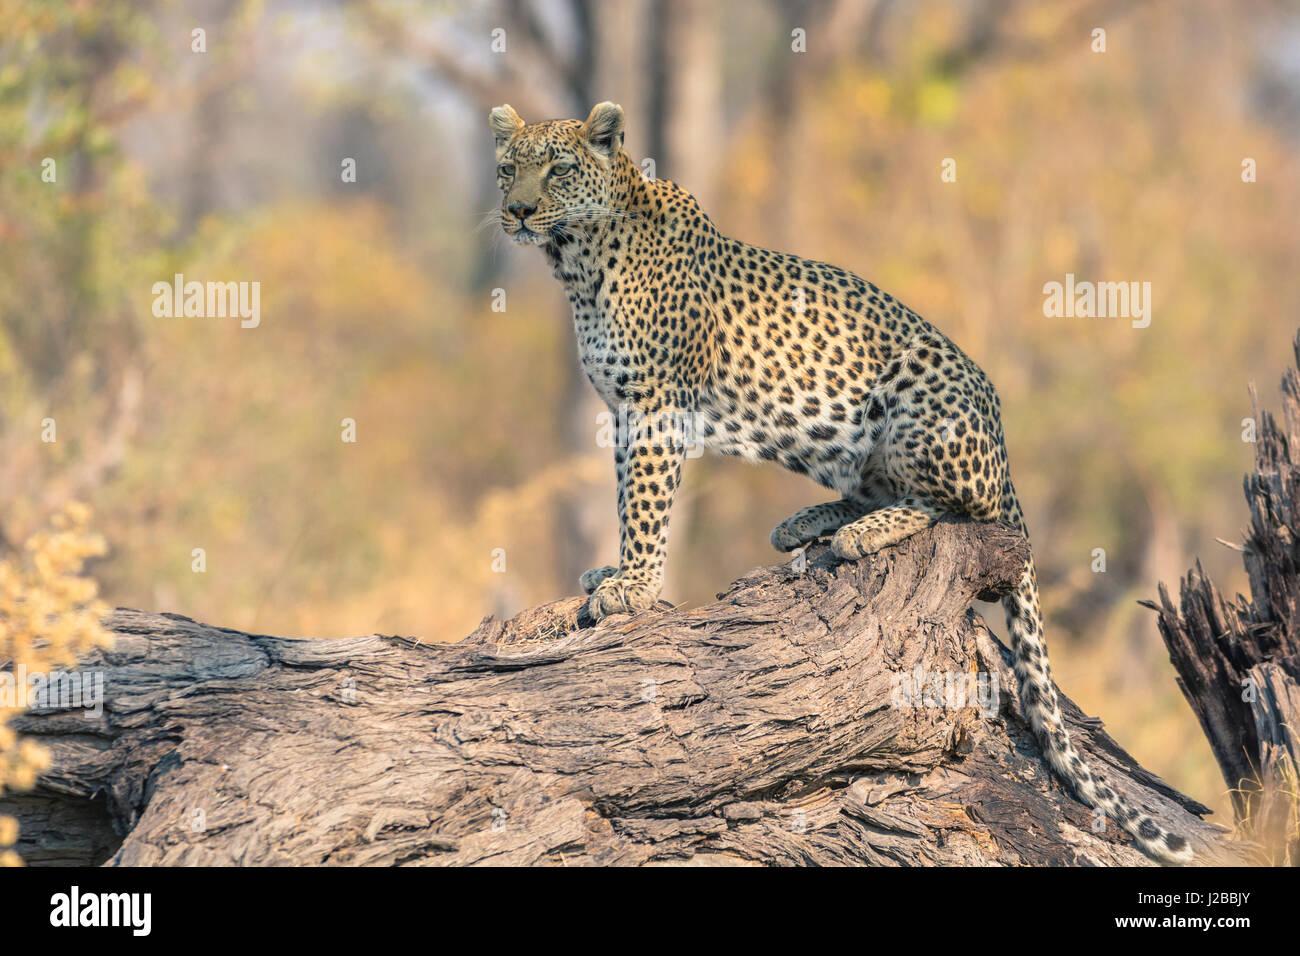 Botswana. Okavango Delta. Khwai concession. Leopard (Panthera pardus) looks out for prey on a fallen log. - Stock-Bilder